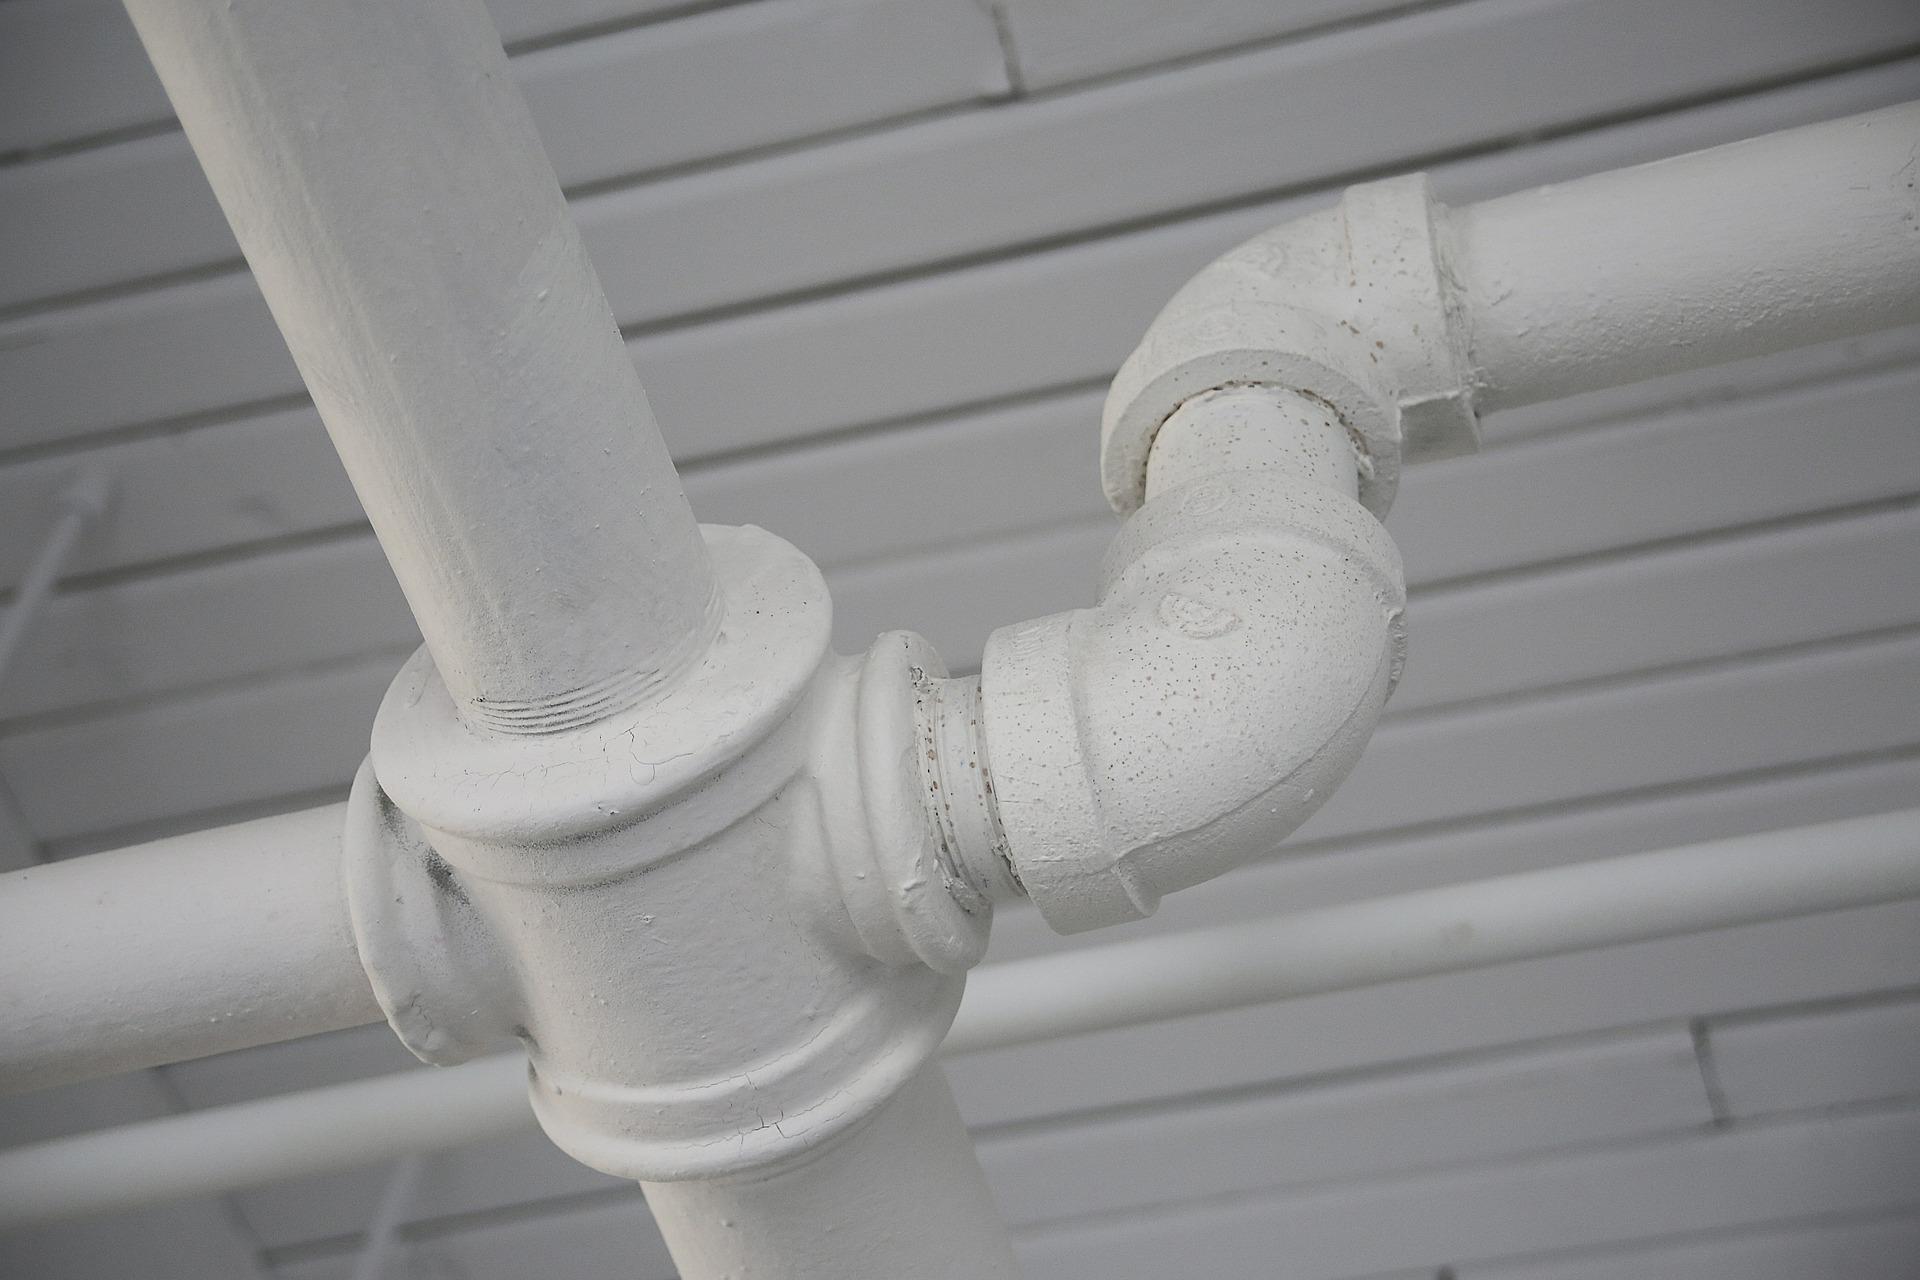 Water Leaking Repair